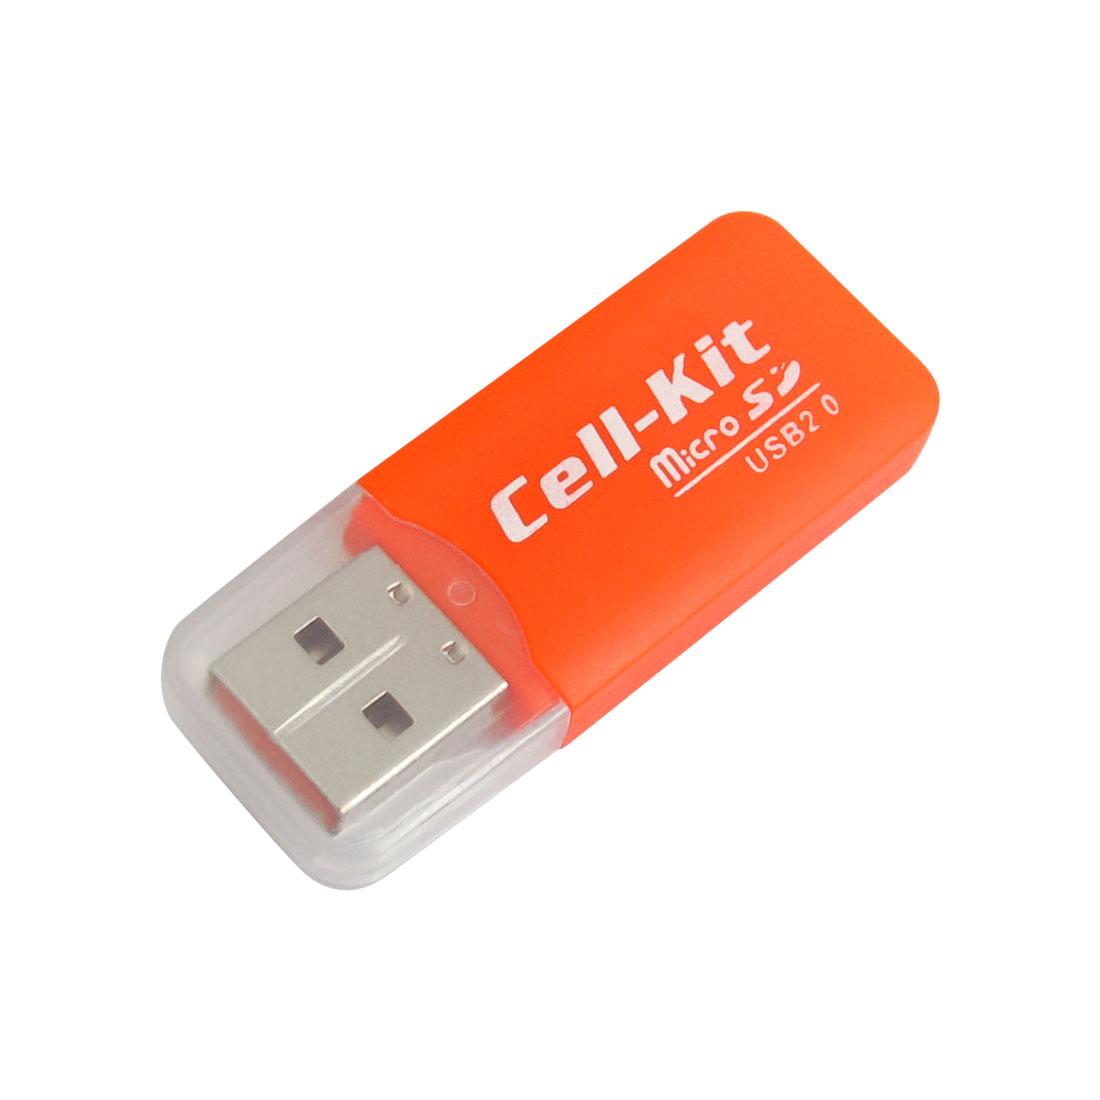 Orange Plastic Housing Shell USB 2.0 Micro SD Mini Memory Card Reader